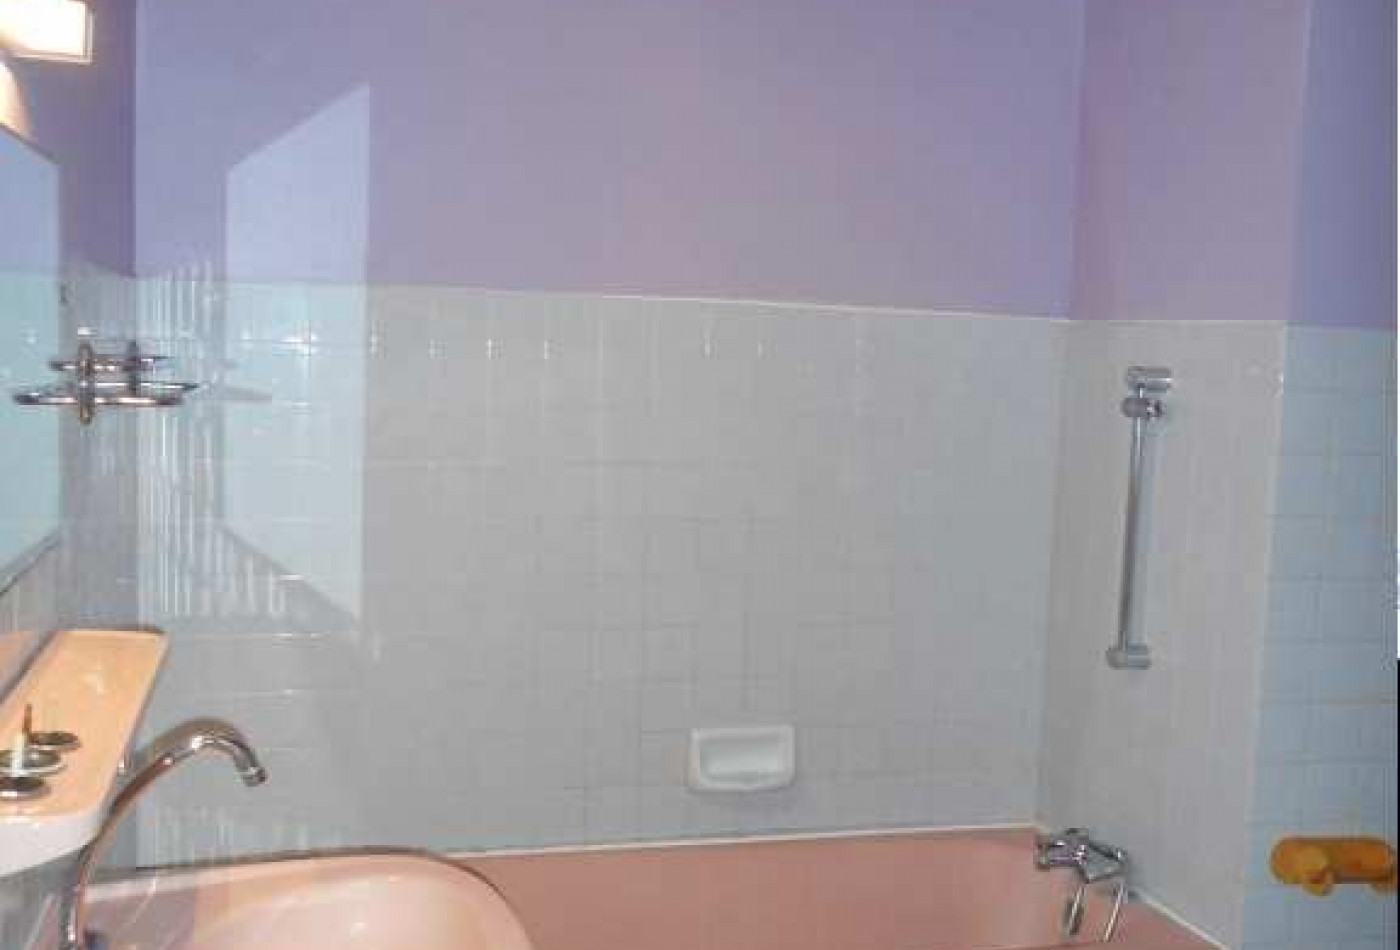 appartement en vente montpellier r f 341681154 frances immobilier. Black Bedroom Furniture Sets. Home Design Ideas